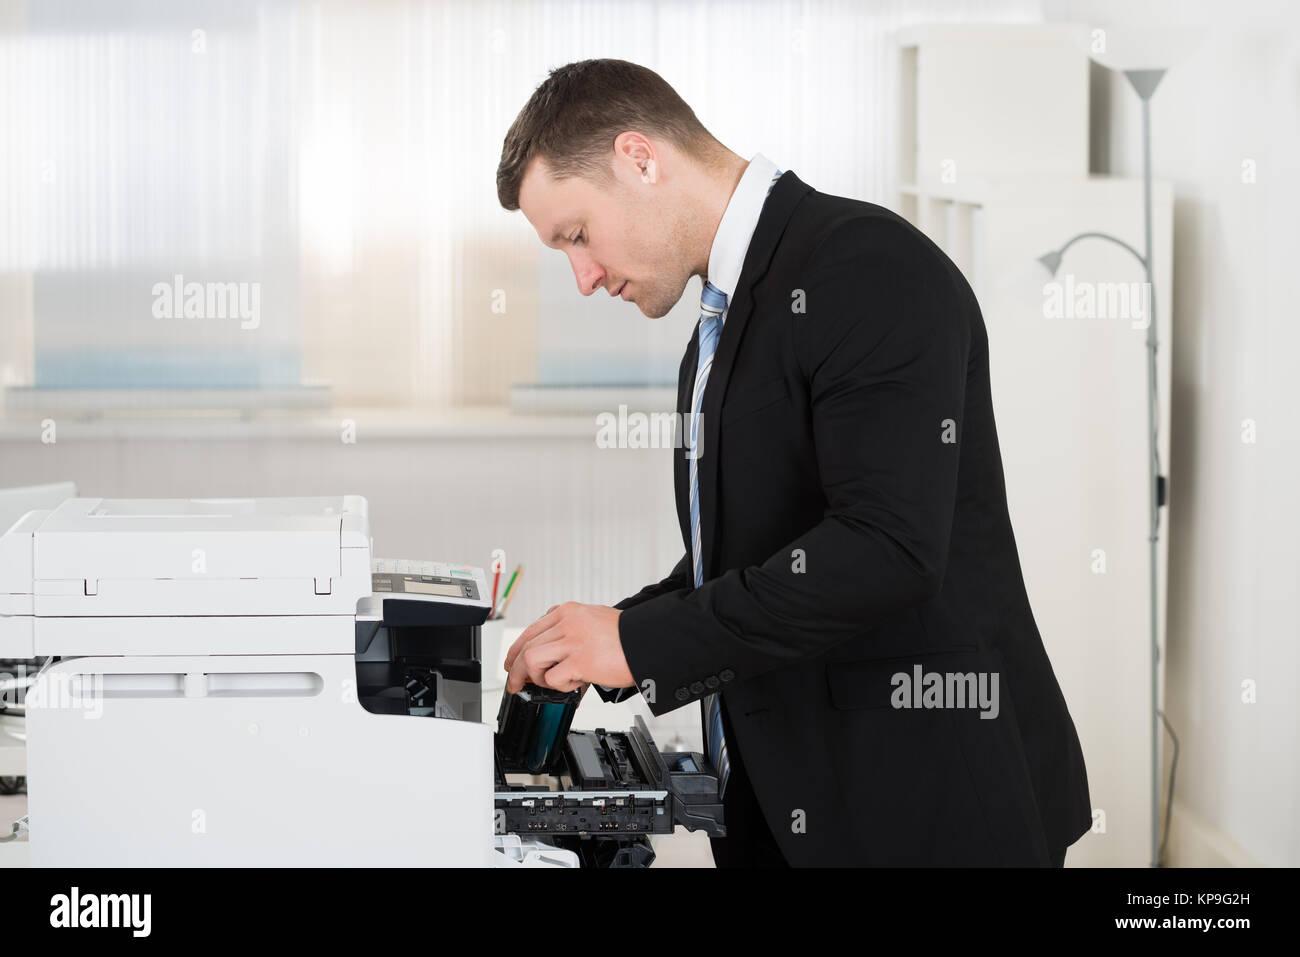 Businessman Adjusting Cartridge In Photocopy Machine - Stock Image